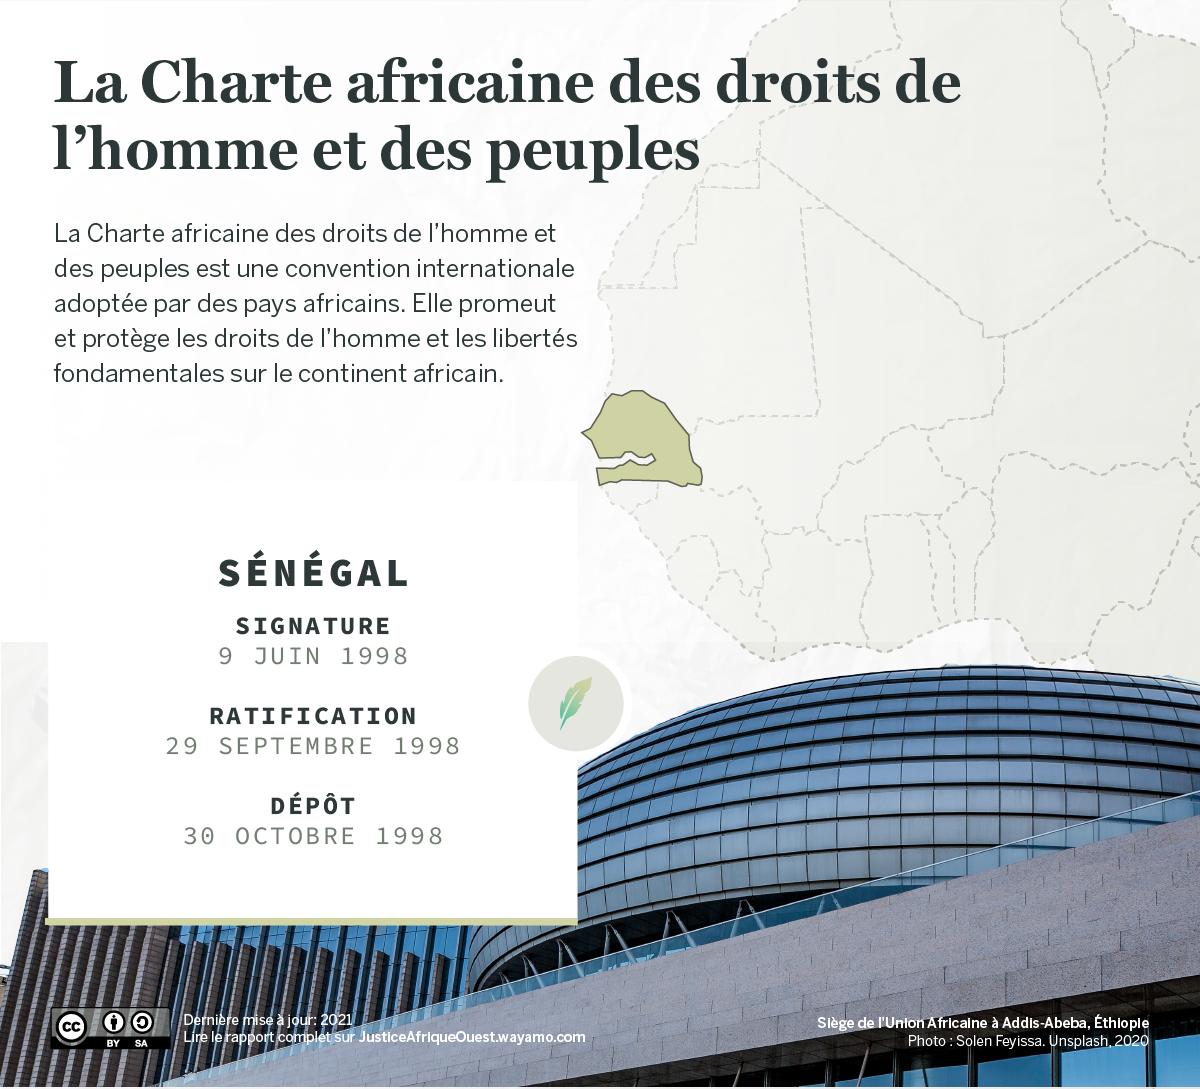 SENEGAL_Charte africaine - Wayamo Foundation (CC BY-SA 4.0)